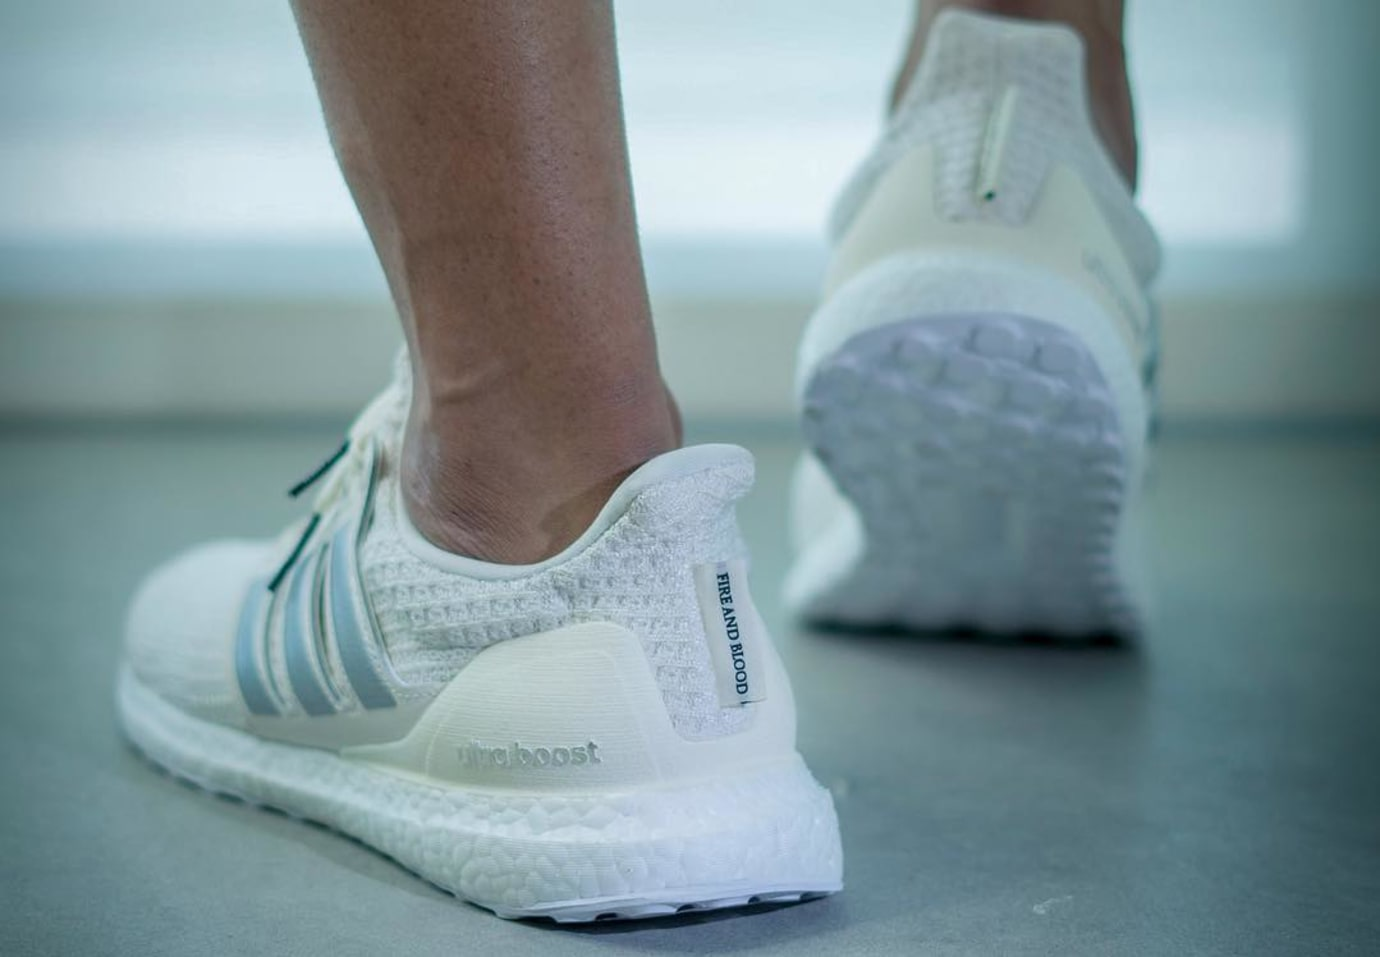 game-of-thrones-adidas-ultra-boost-4-0-house-of-targaryen-on-feet-heel